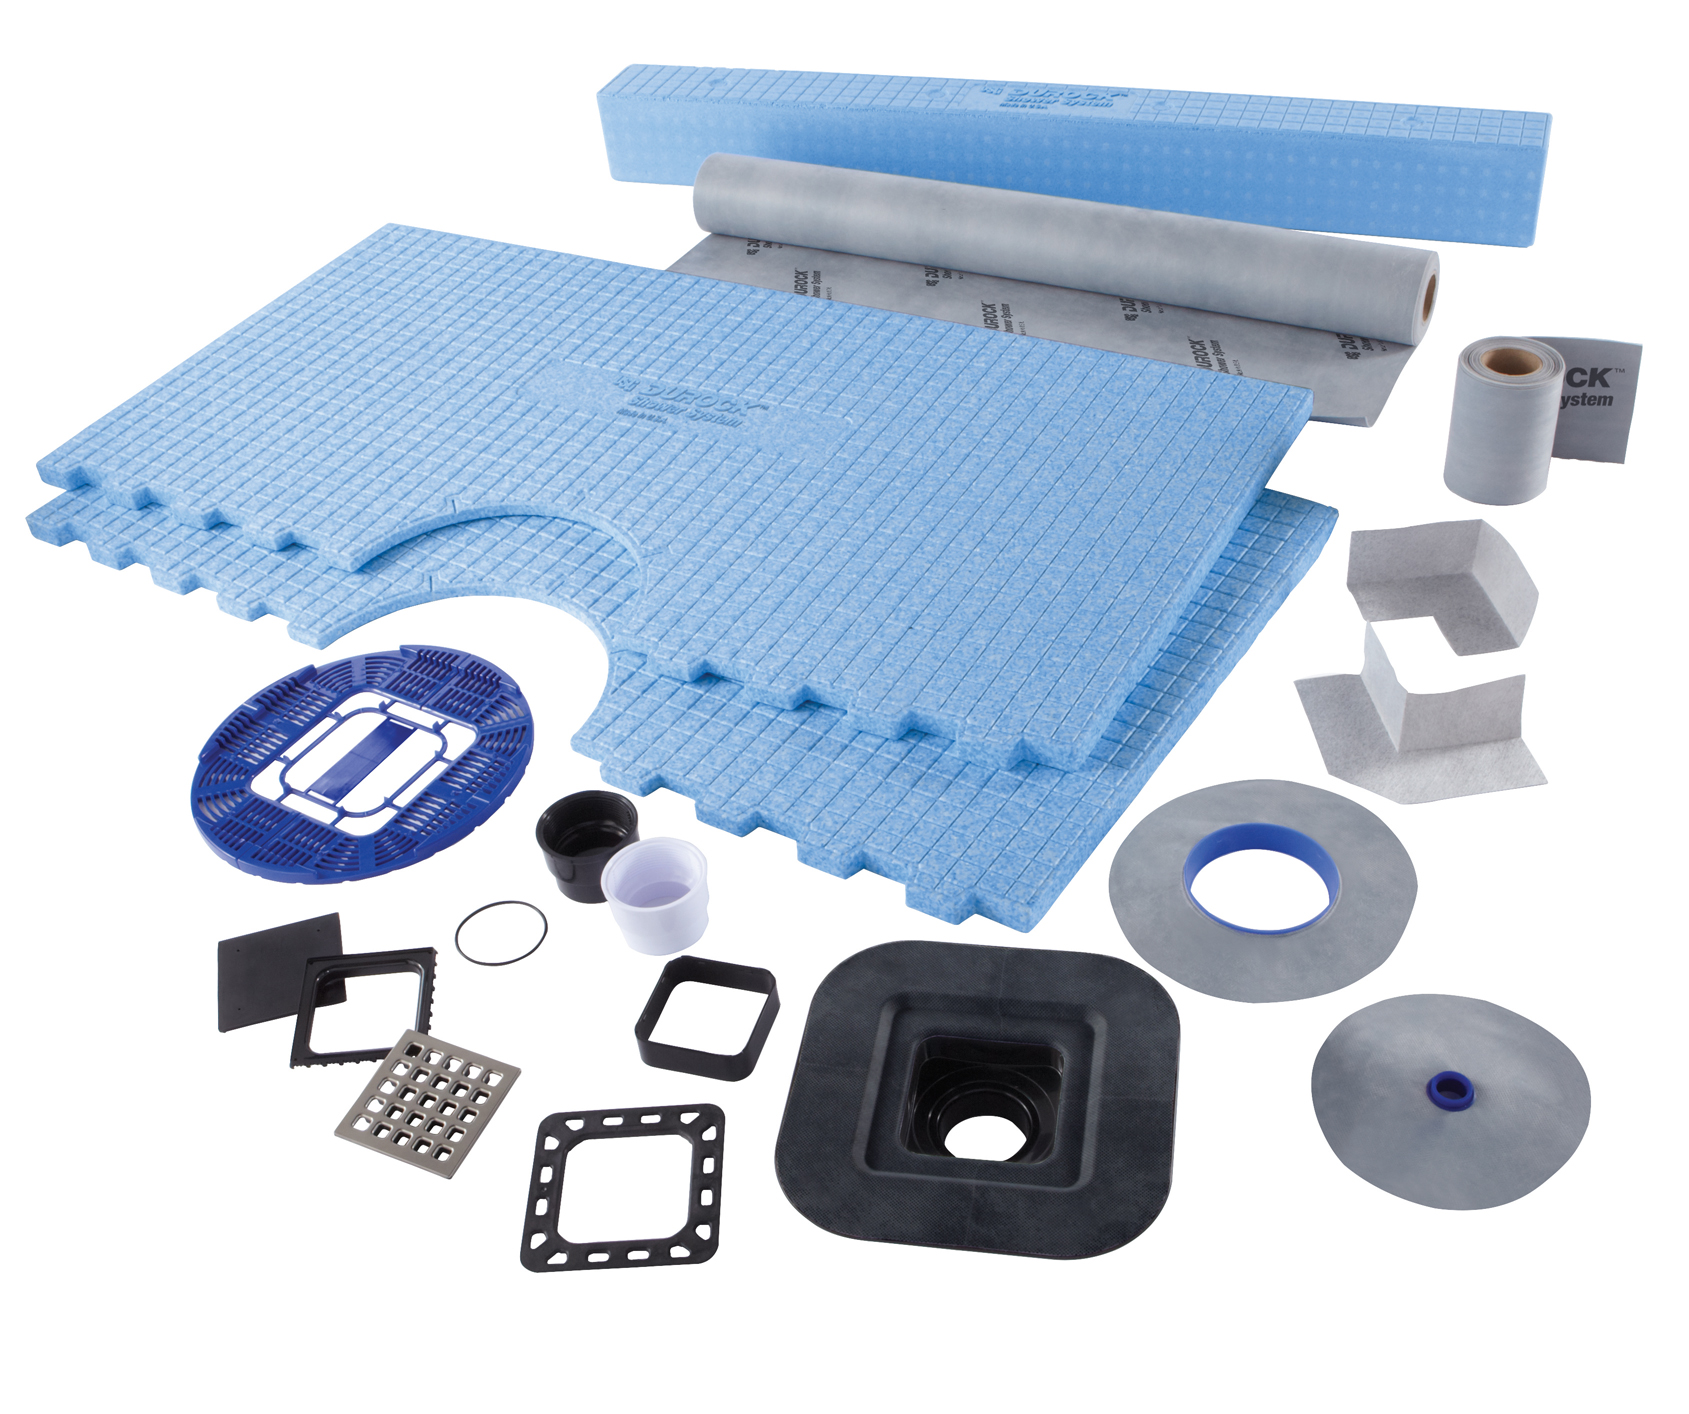 durock shower system portfolio (2)